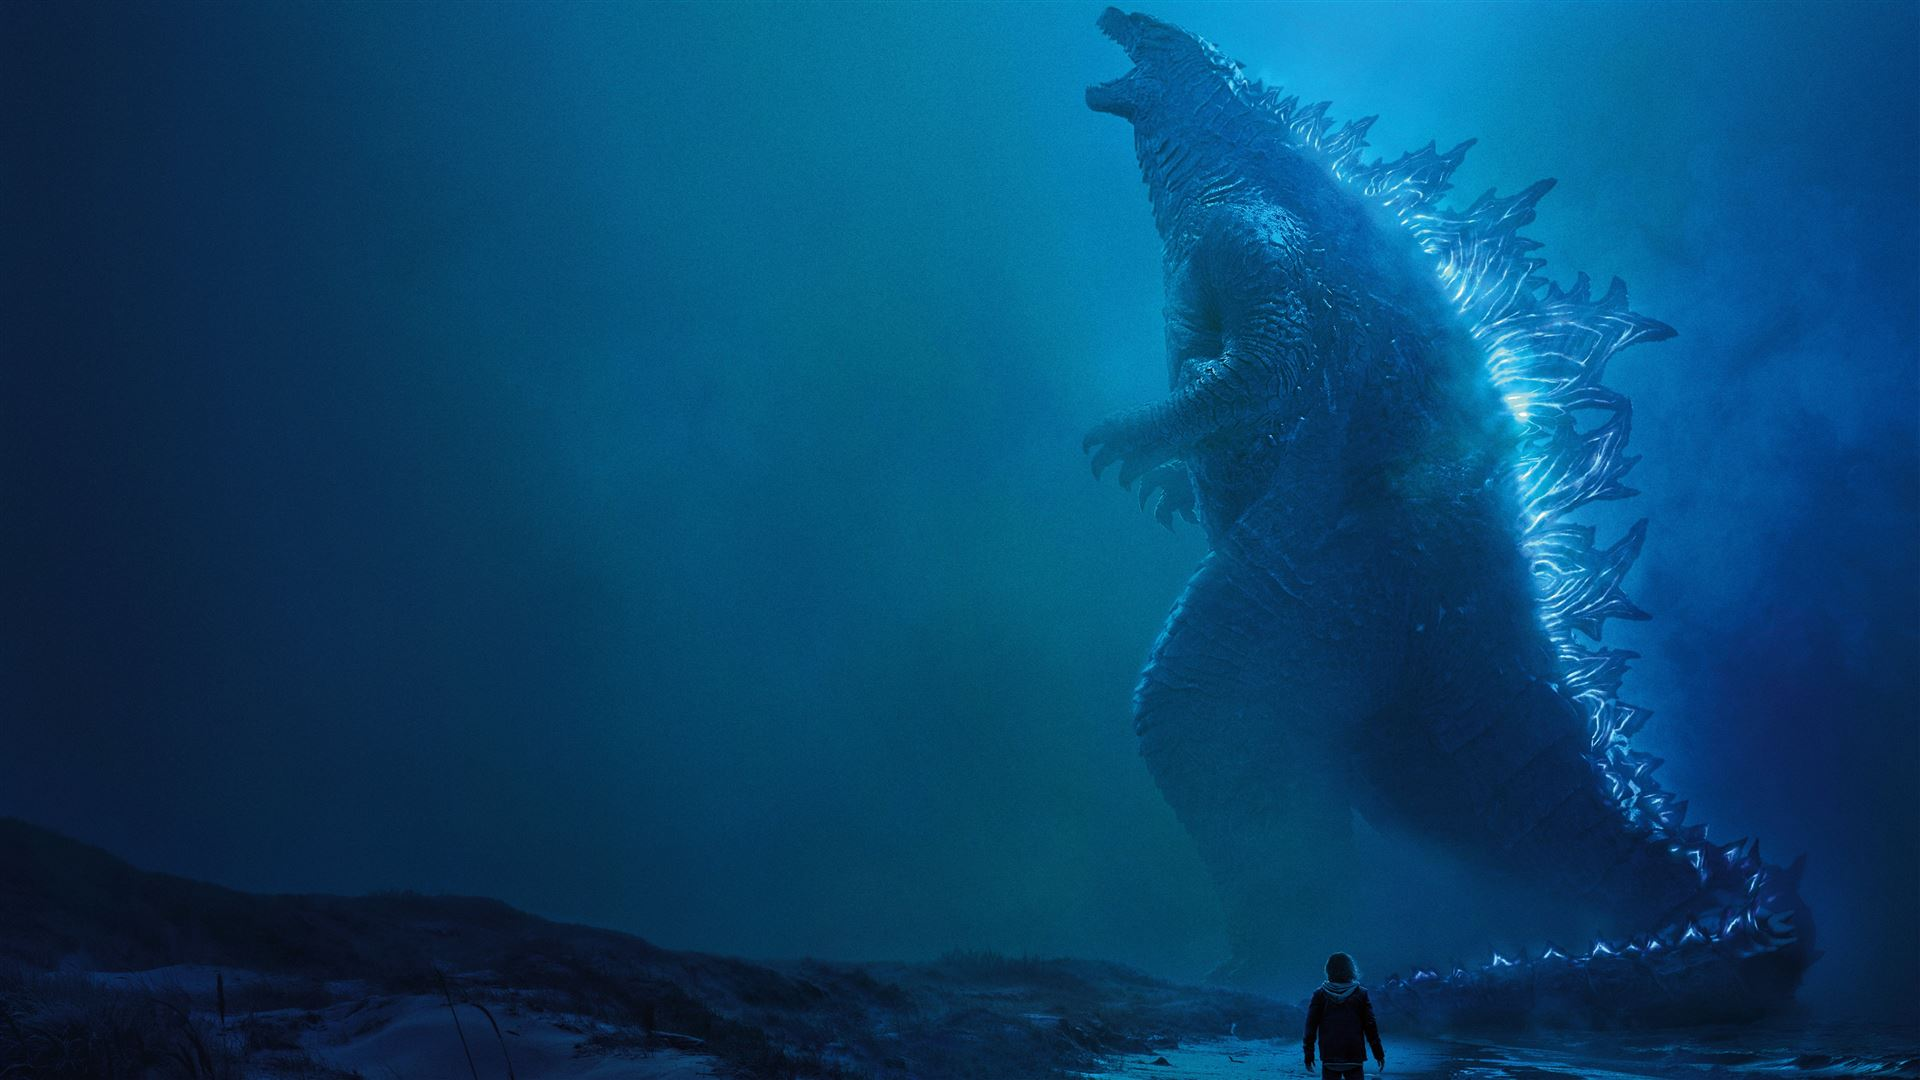 Godzilla King Of The Monsters 8k Mac Wallpaper Download